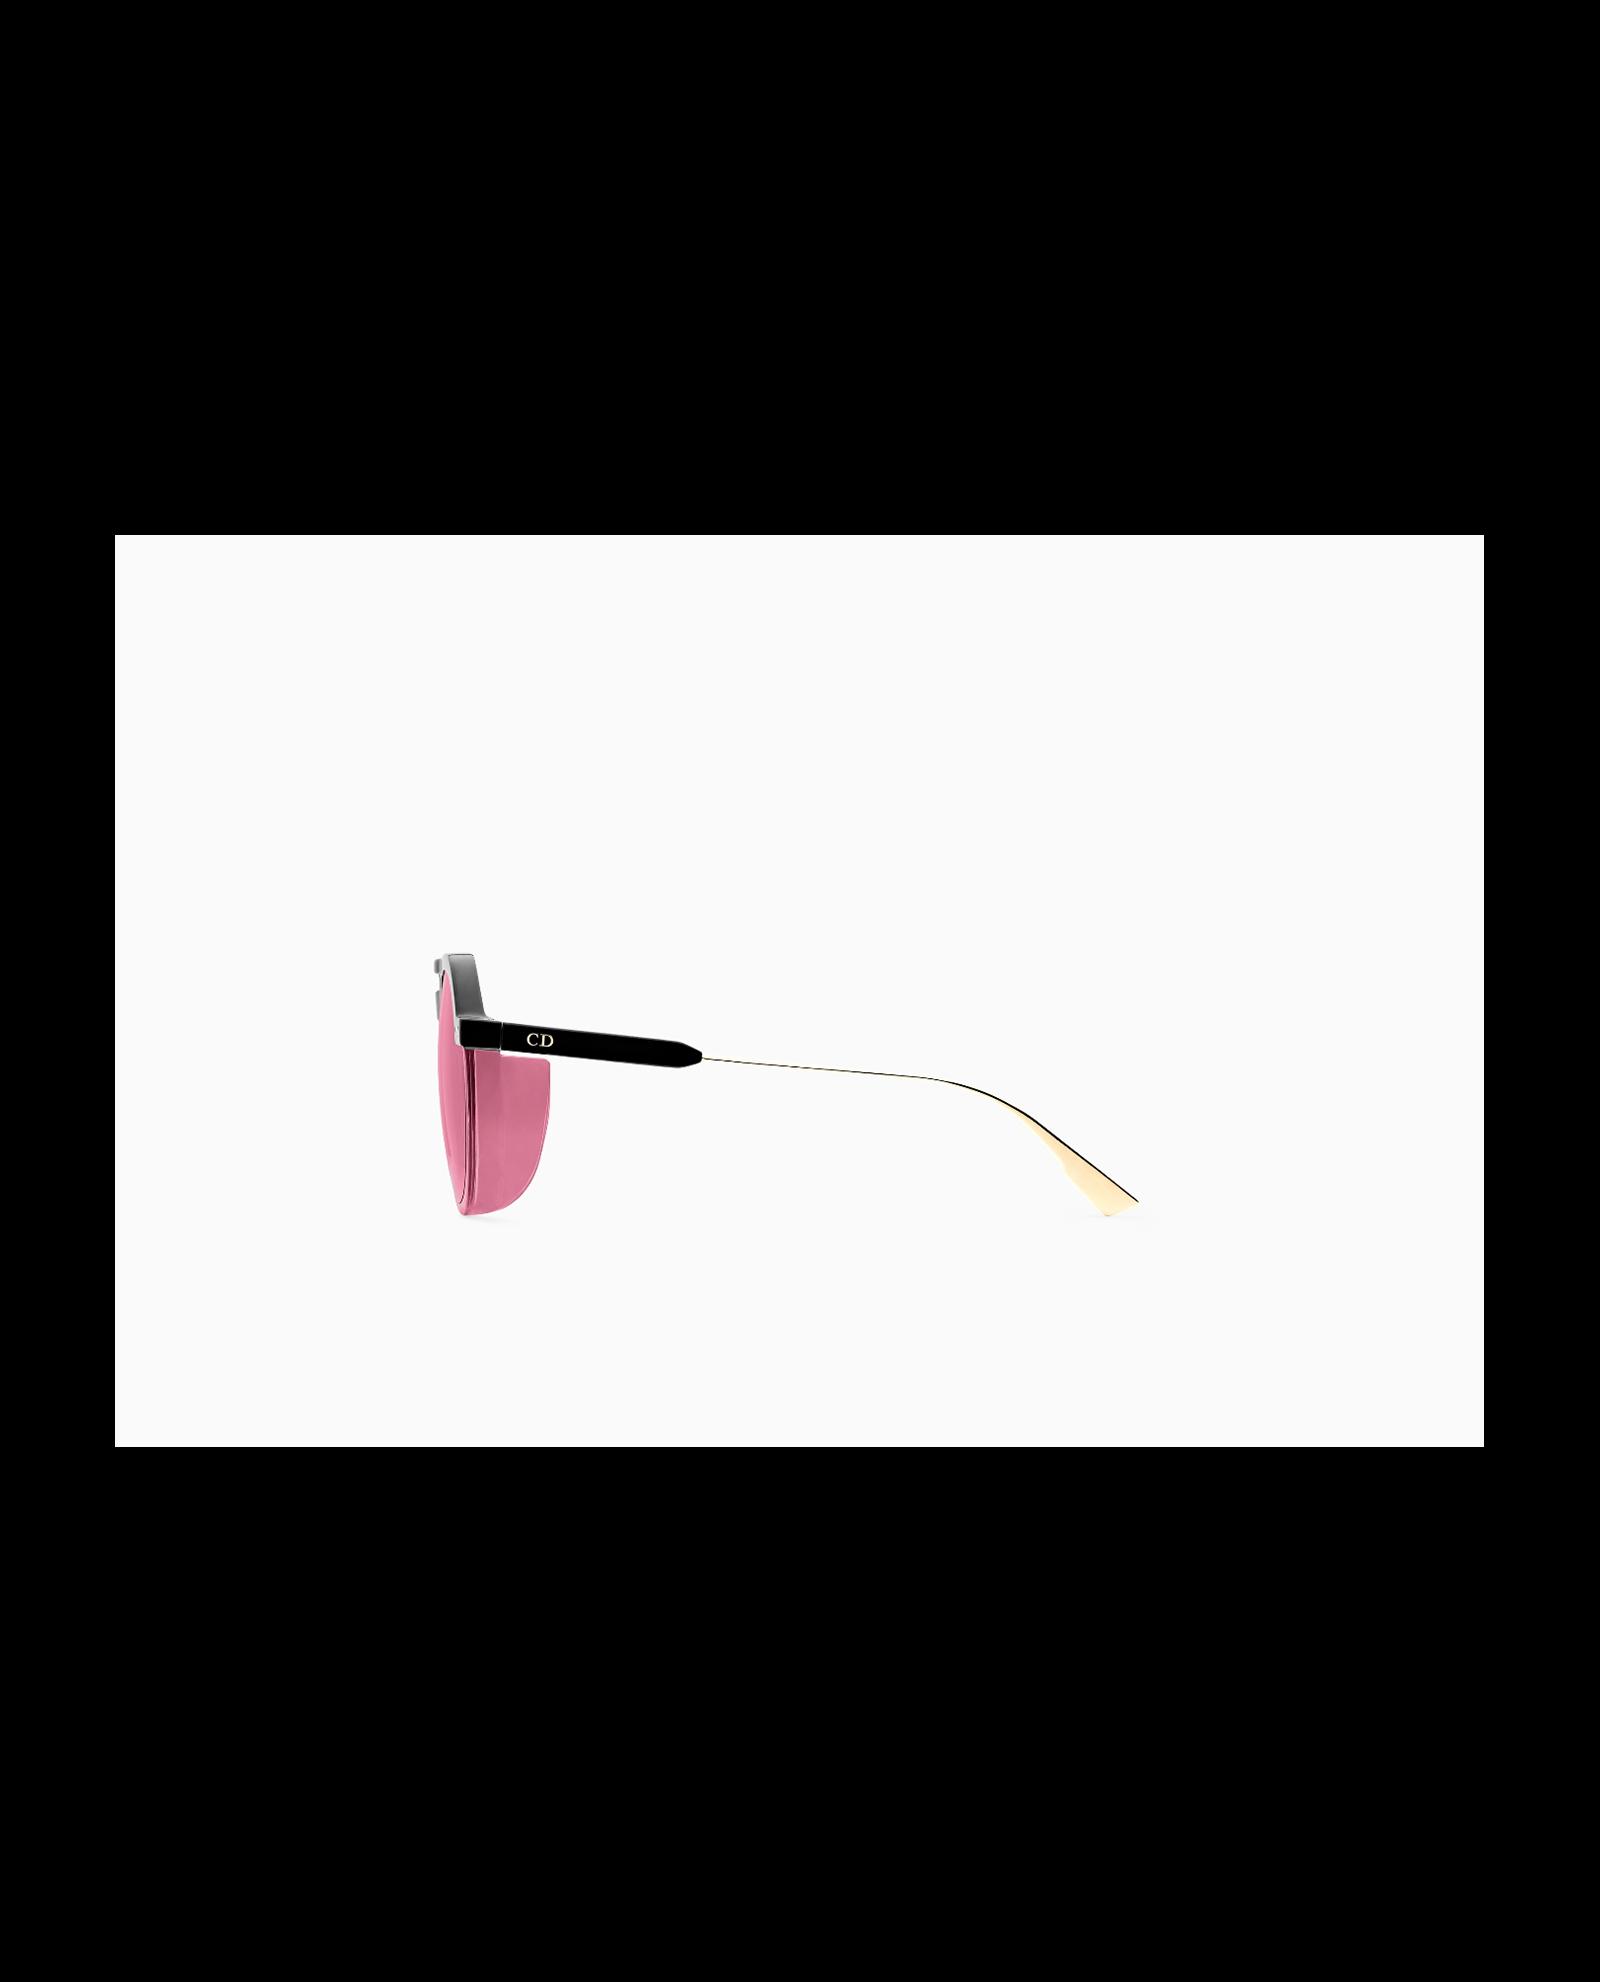 https://www.polydoruoptika.gr/wp-content/uploads/2018/03/diorclub-pink-3.png